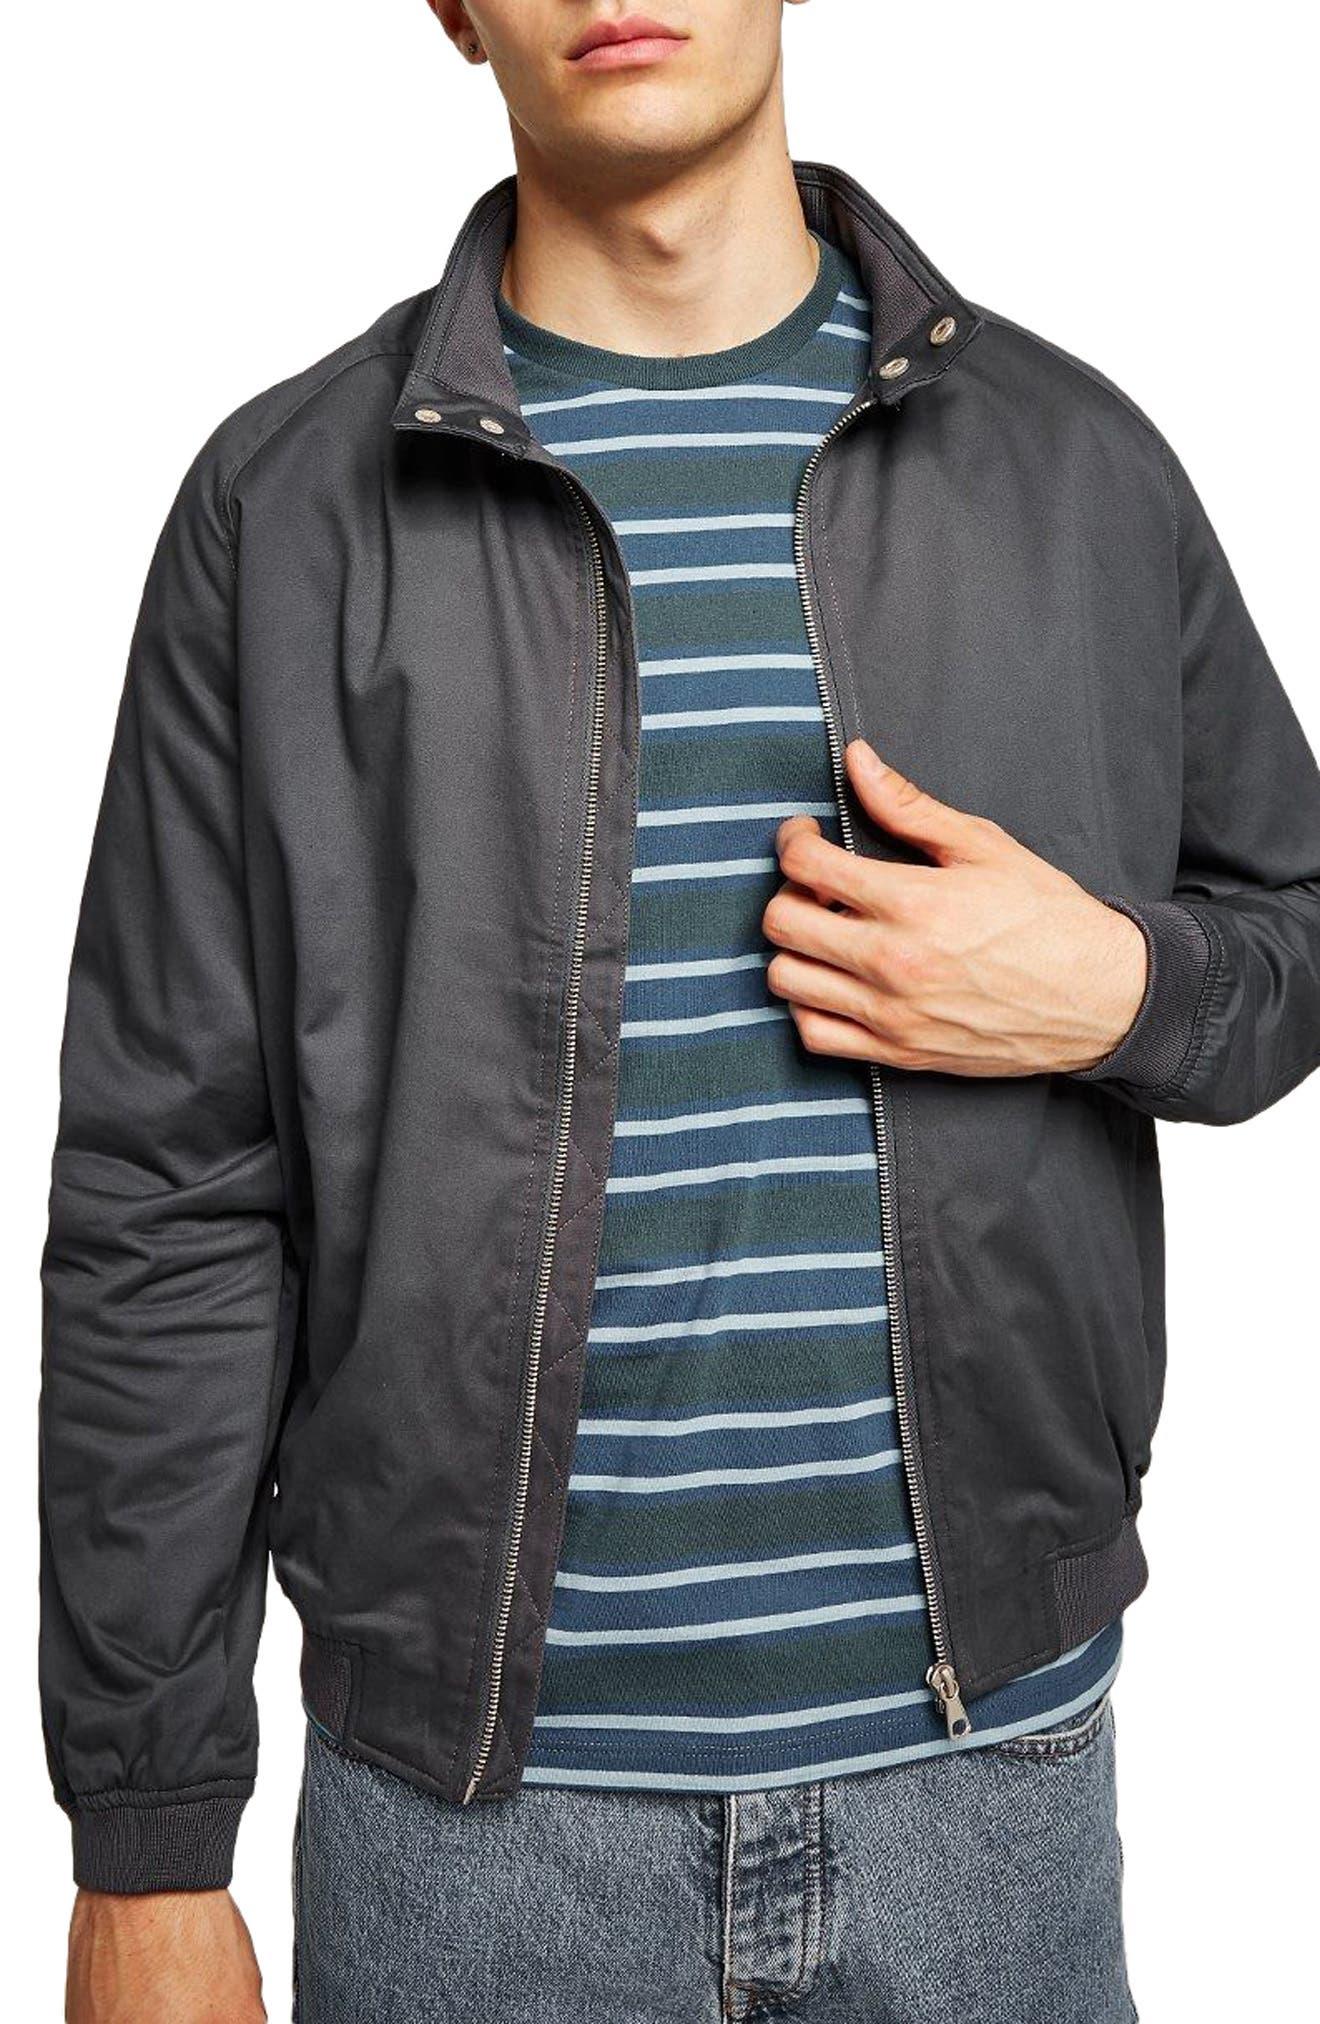 Topman Harrington Jacket